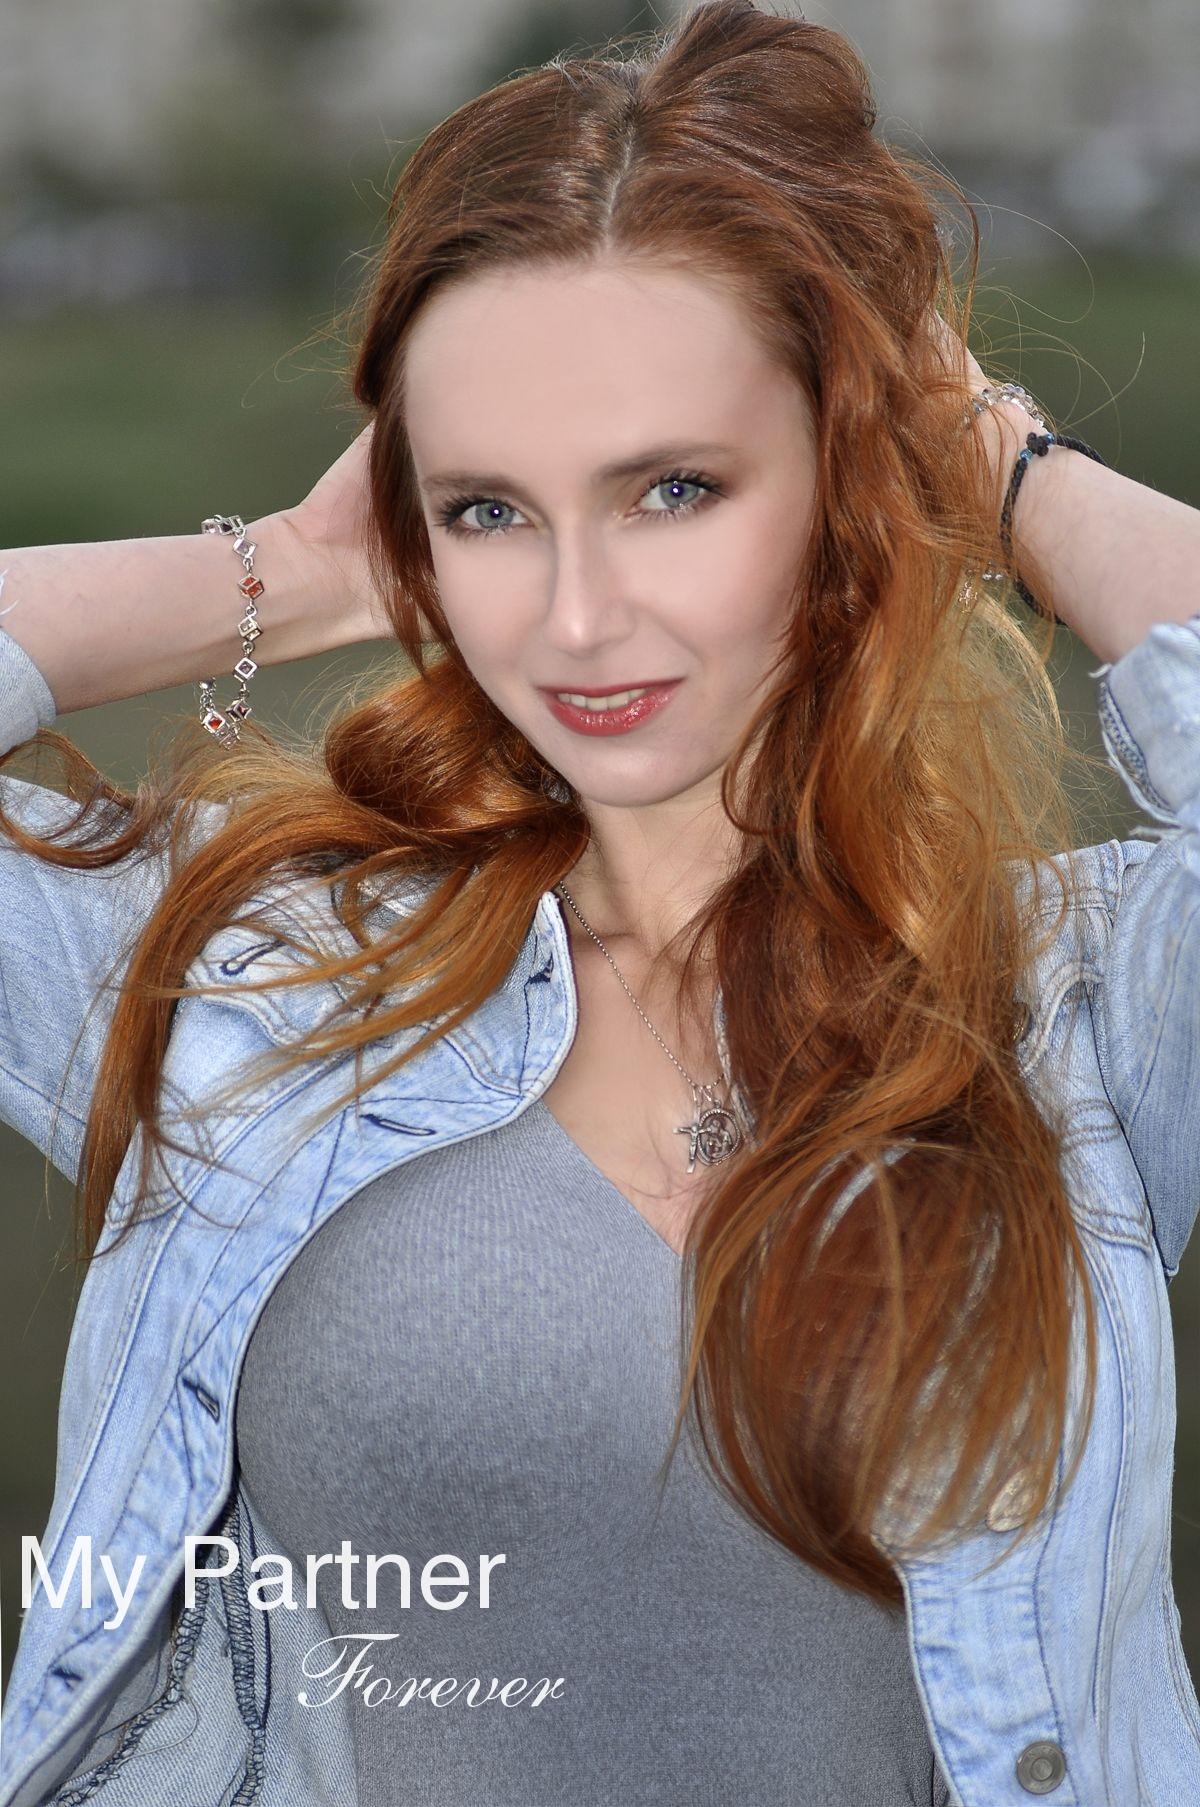 olga dating kiev Dating with beautiful cheery_olga from kiev, ukraine on lovessa dating with cheery_olga: olga: life is too short break the rules forgive q.